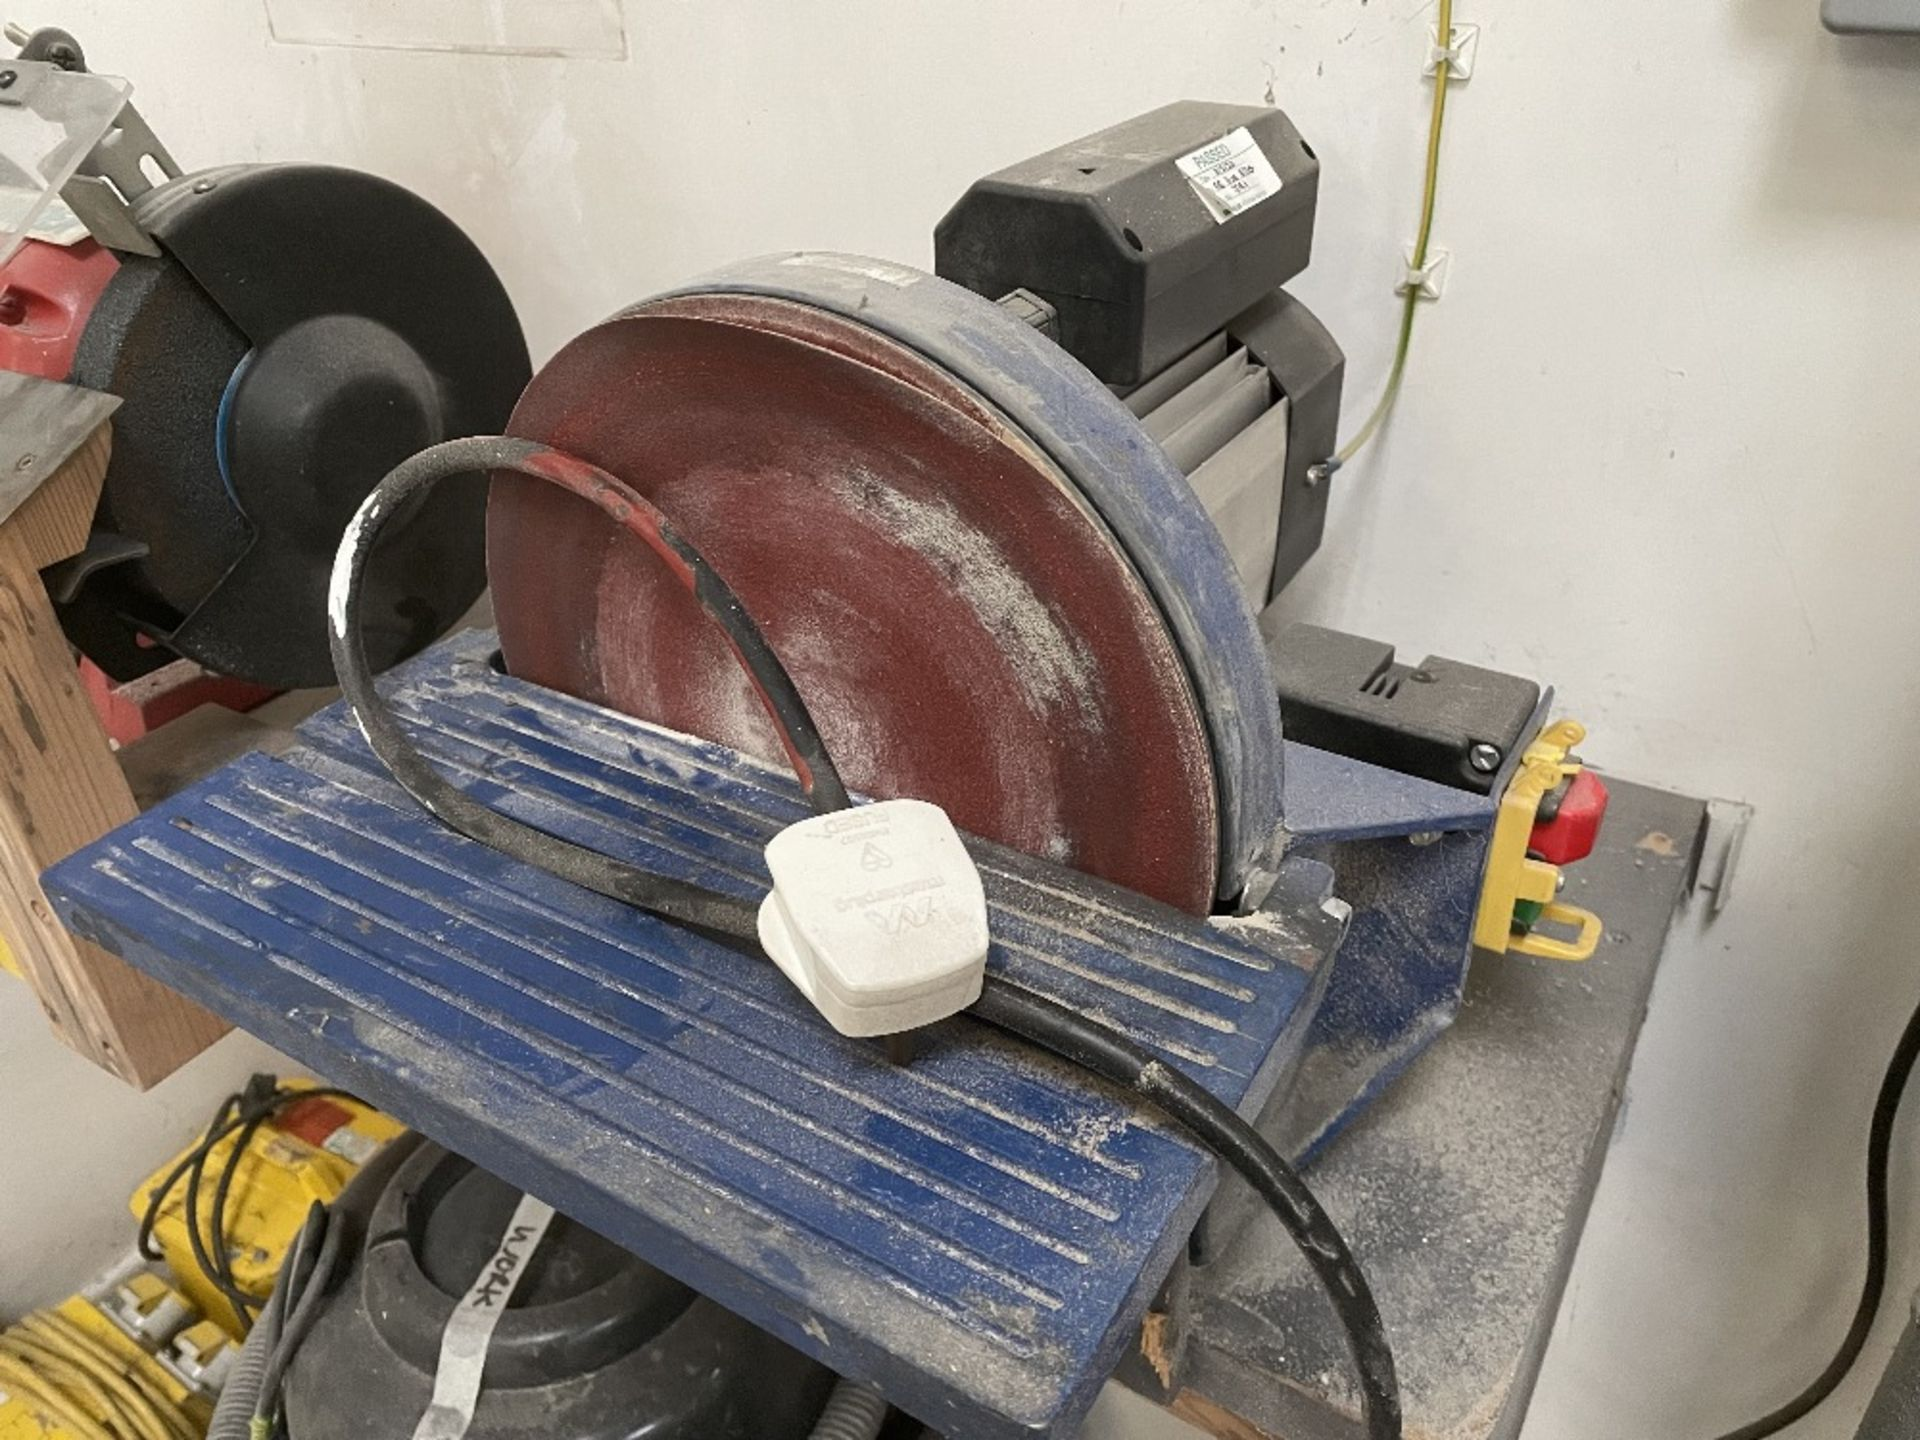 Bench Disc Sander 250mm w/ Spare Sanding Discs - Image 2 of 4